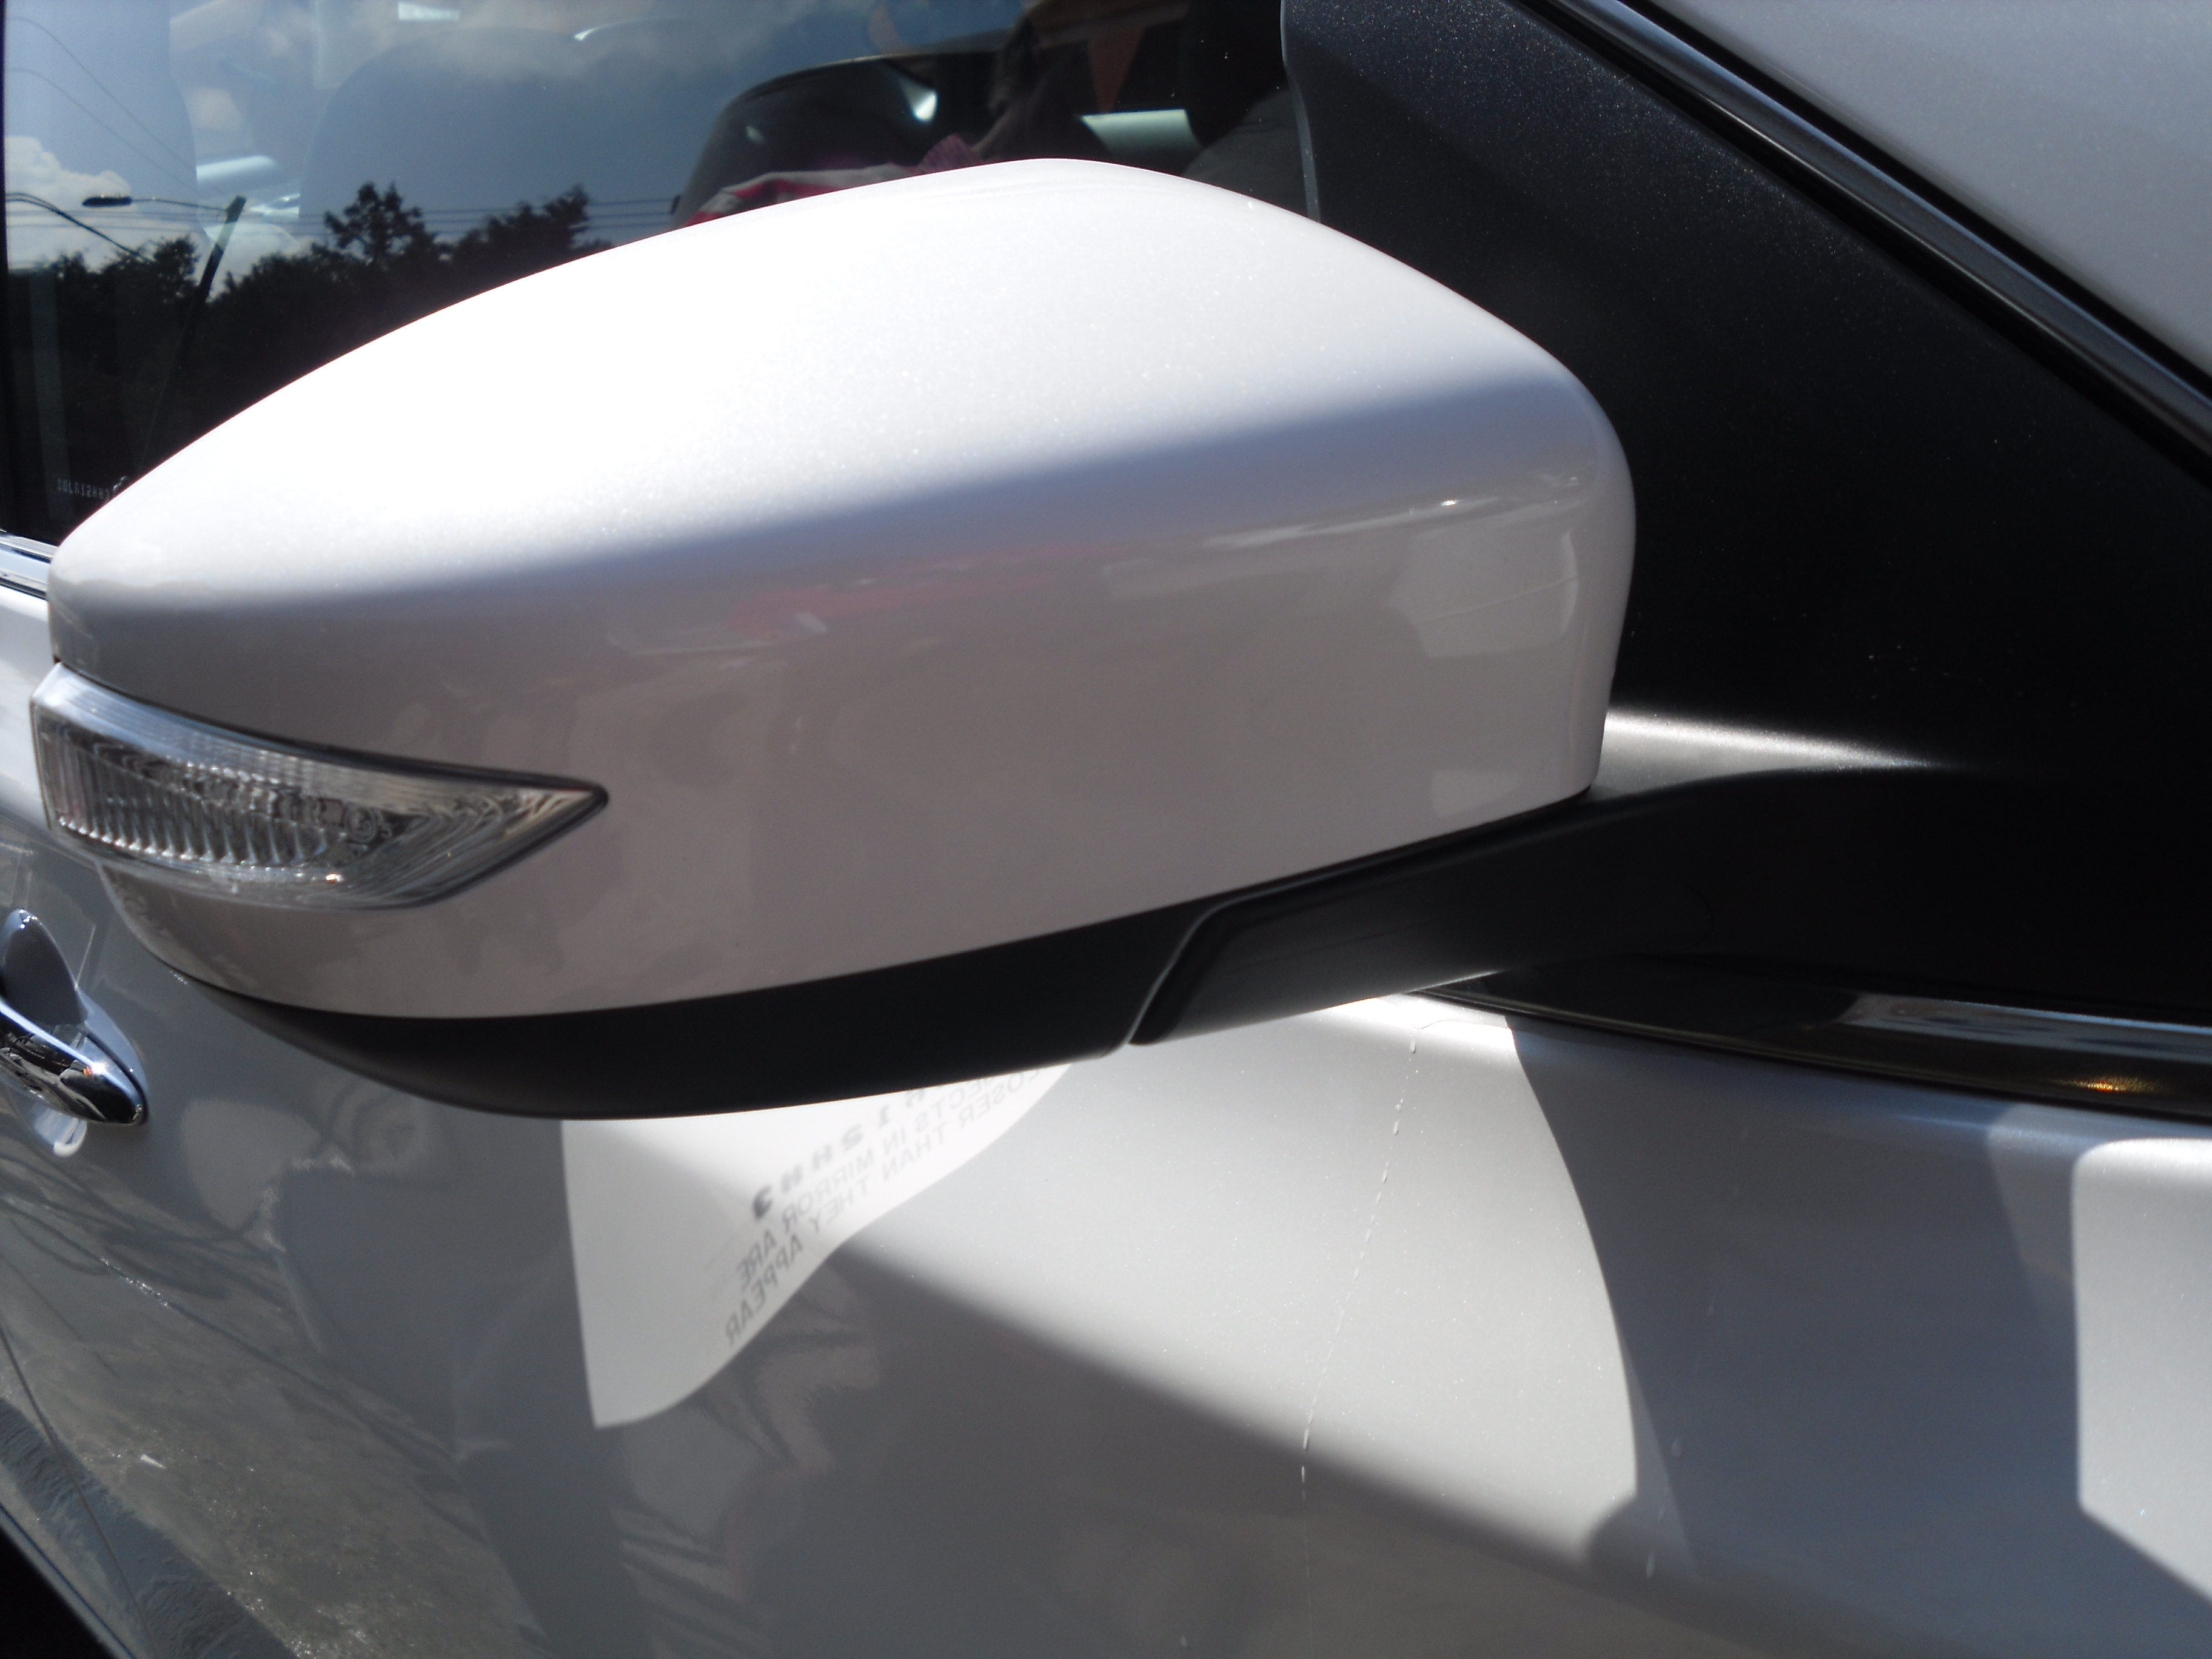 20x cromada tuercas de rueda adecuado para Honda Accord Tourer a llantas de aluminio GEM a...